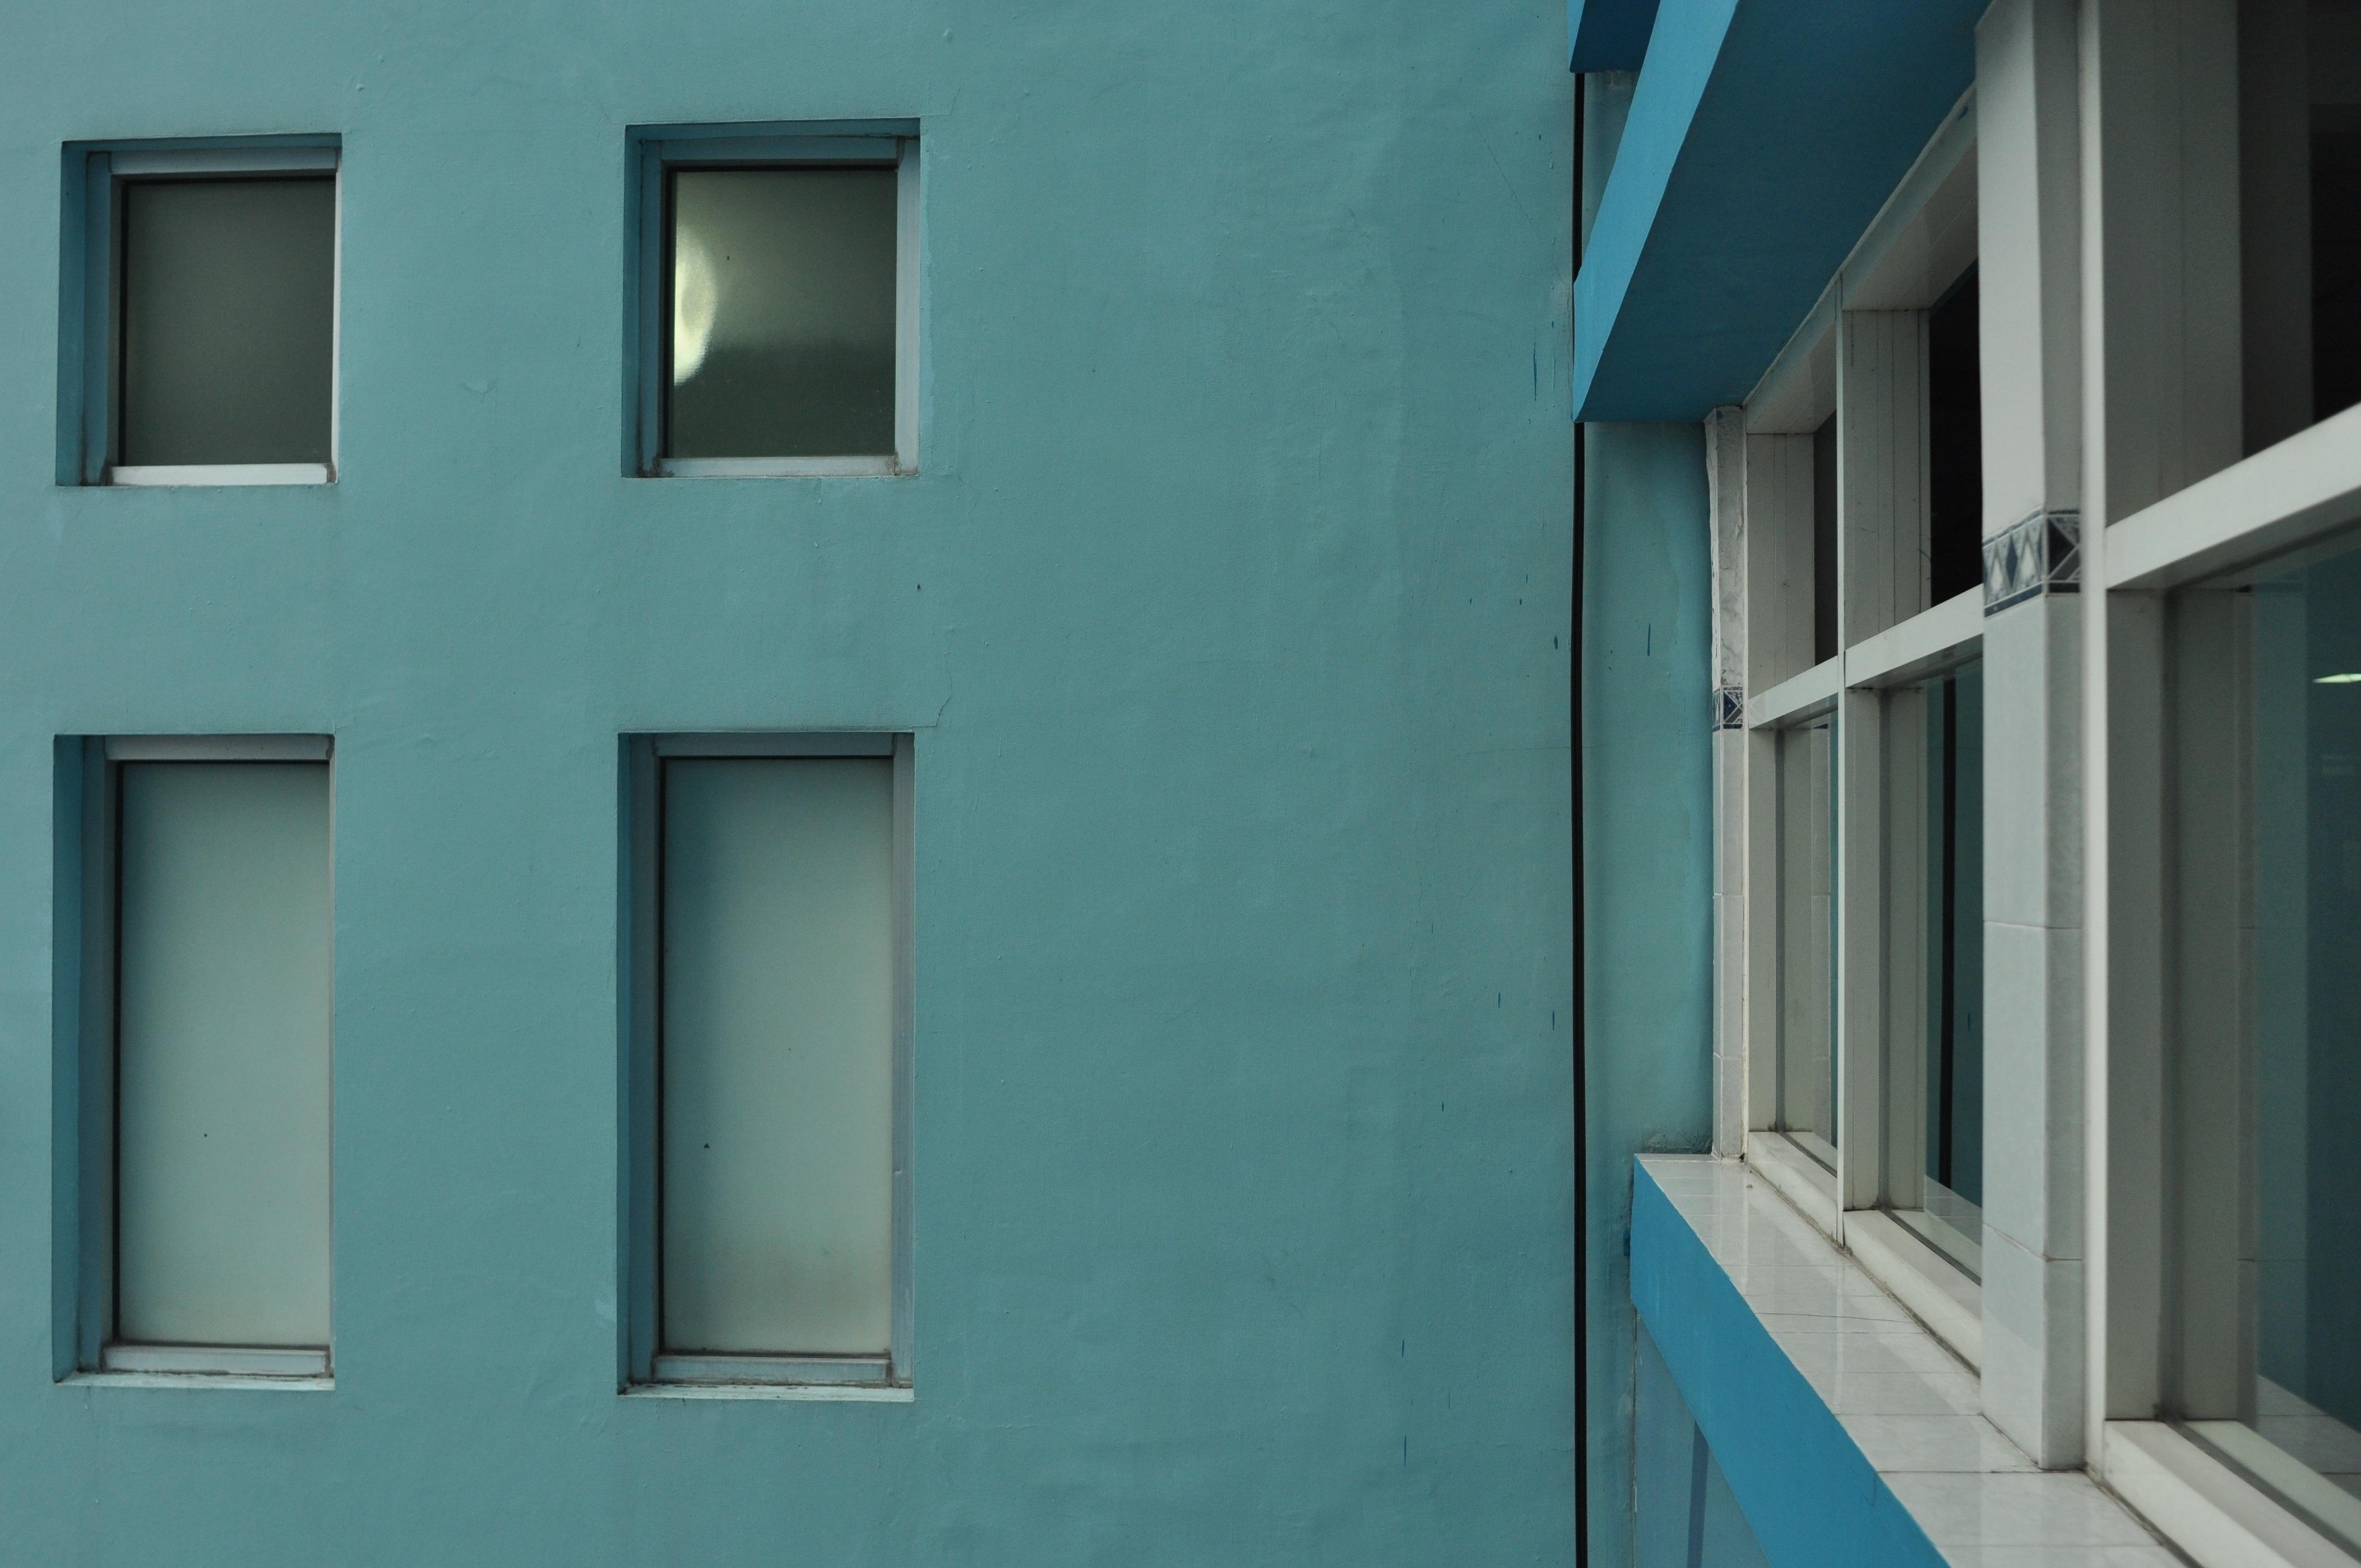 blanco casa ventana edificio casa pared color fachada azul lmpara puerta diseo de interiores ventanas